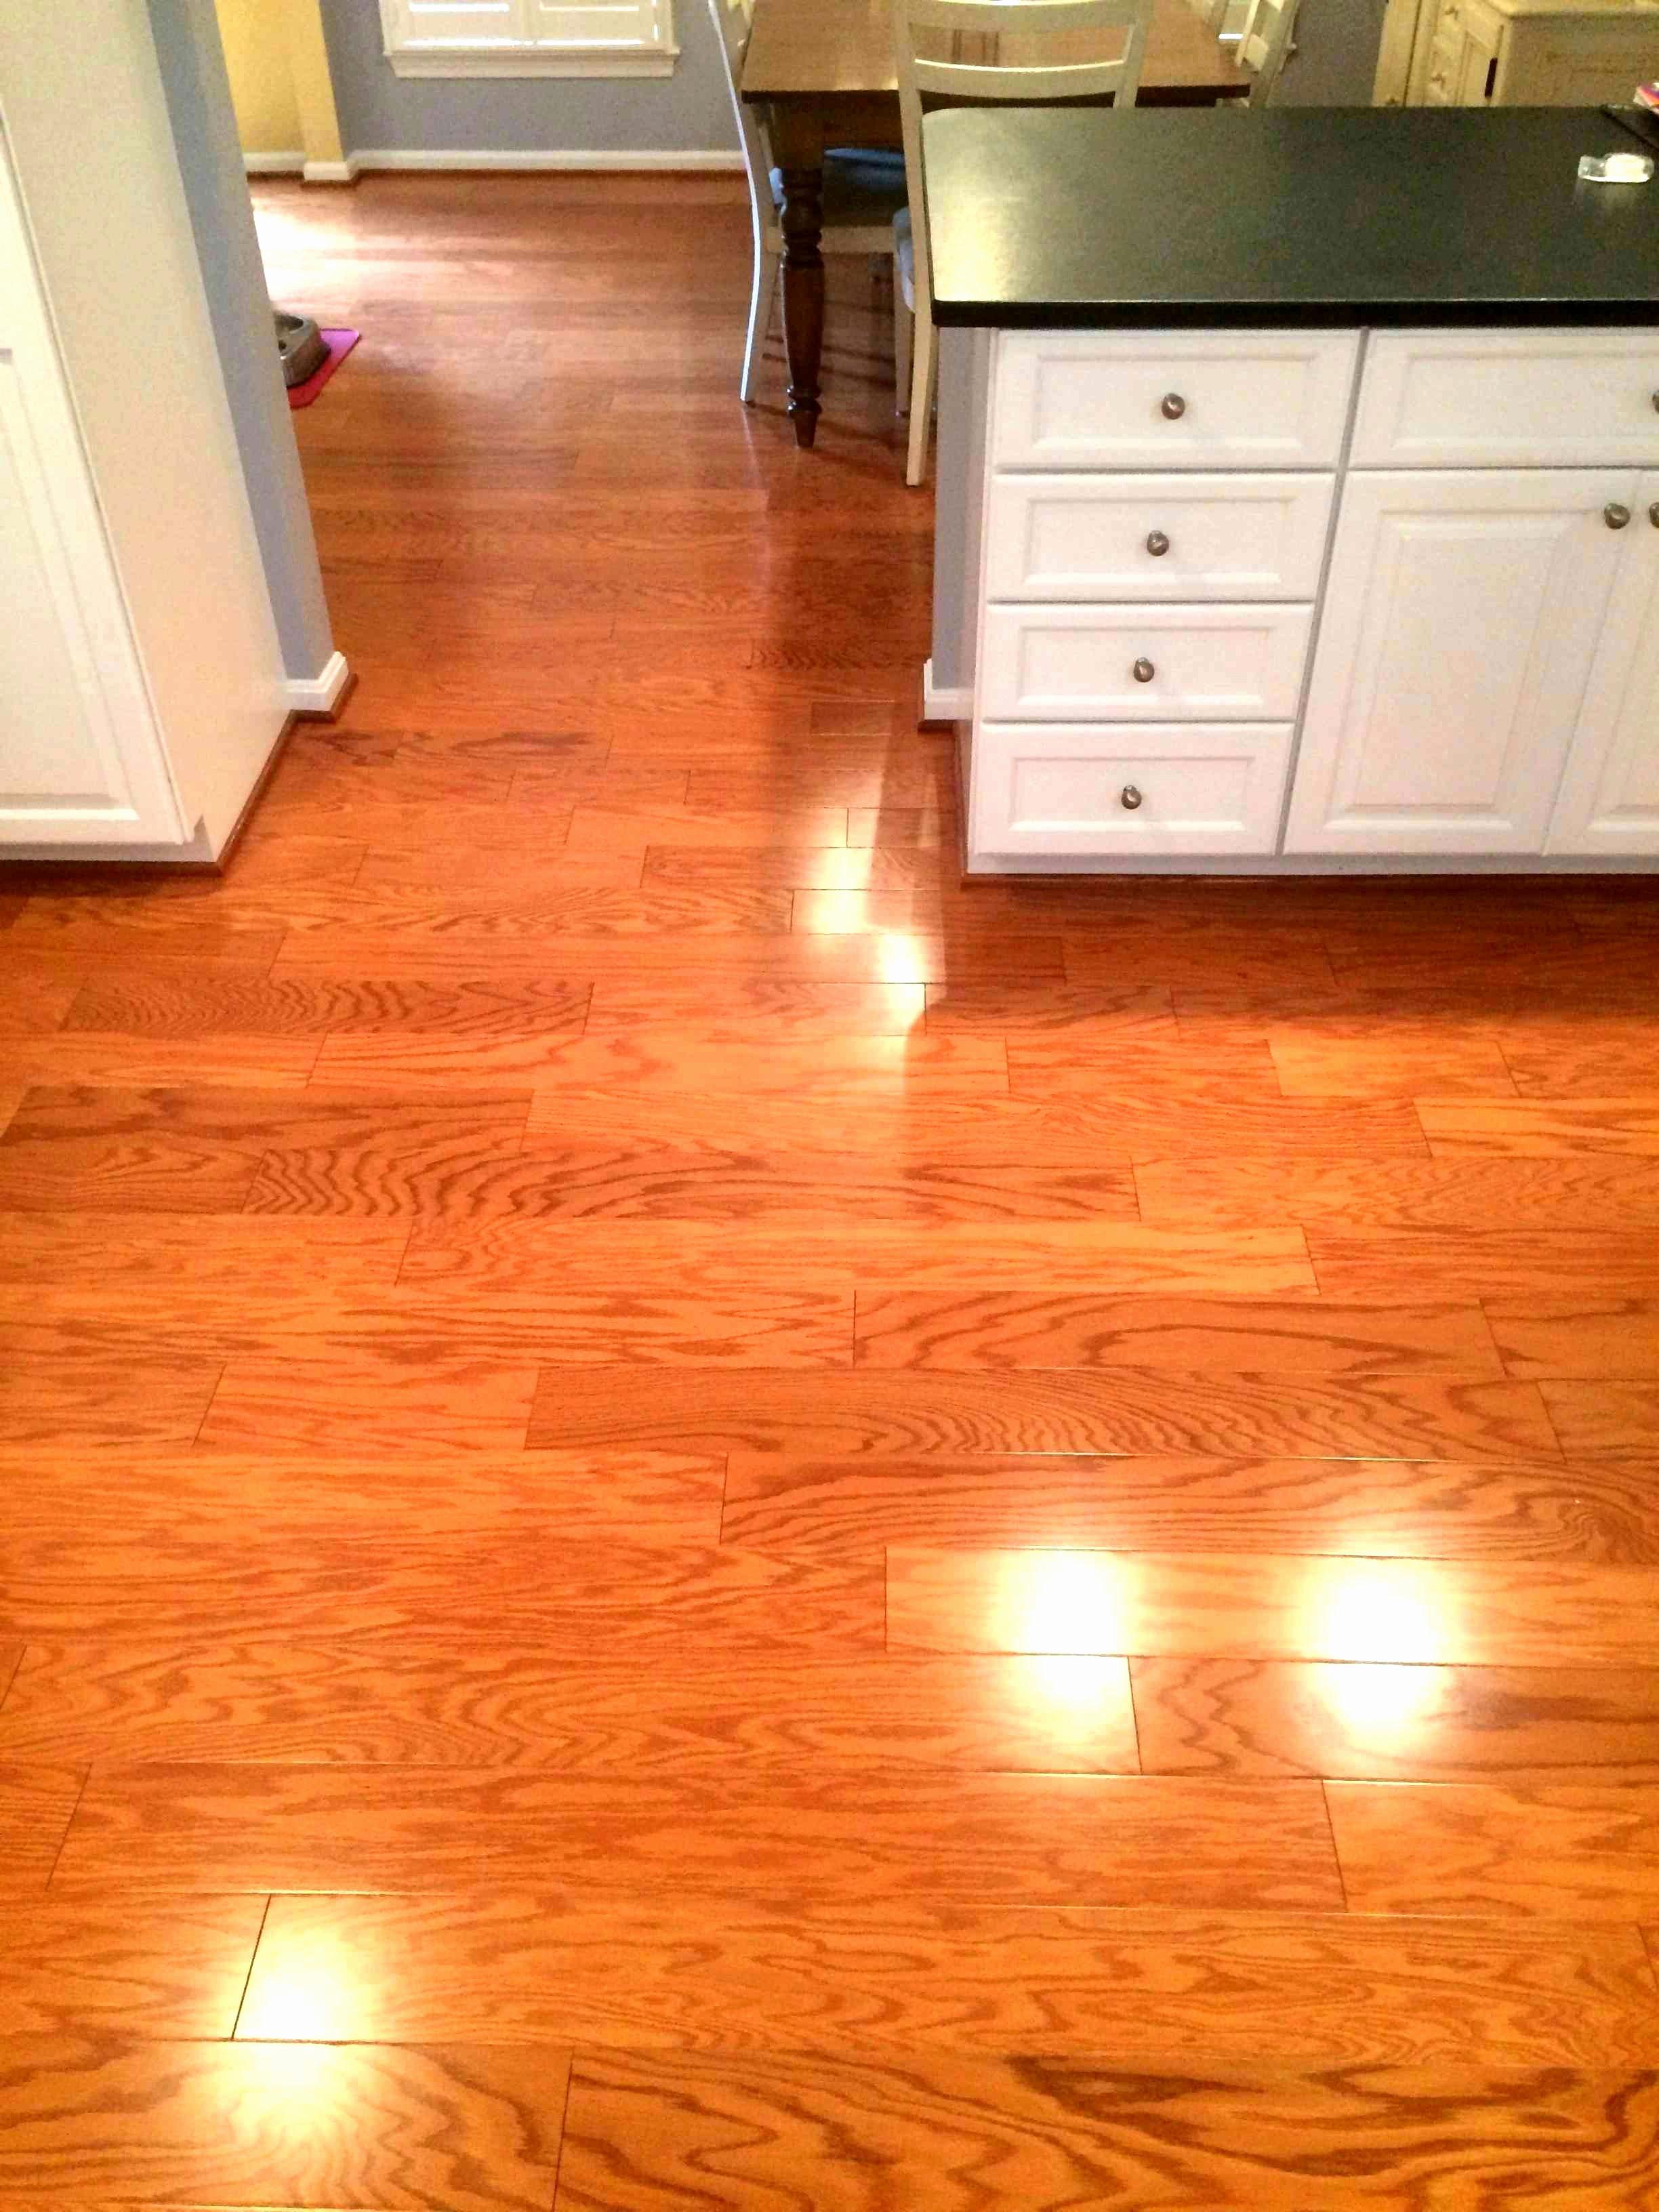 hardwood flooring vs engineered wood flooring cost of underlayment for hardwood floors 20 awesome engineered wood flooring with underlayment for hardwood floors 20 awesome engineered wood flooring cost